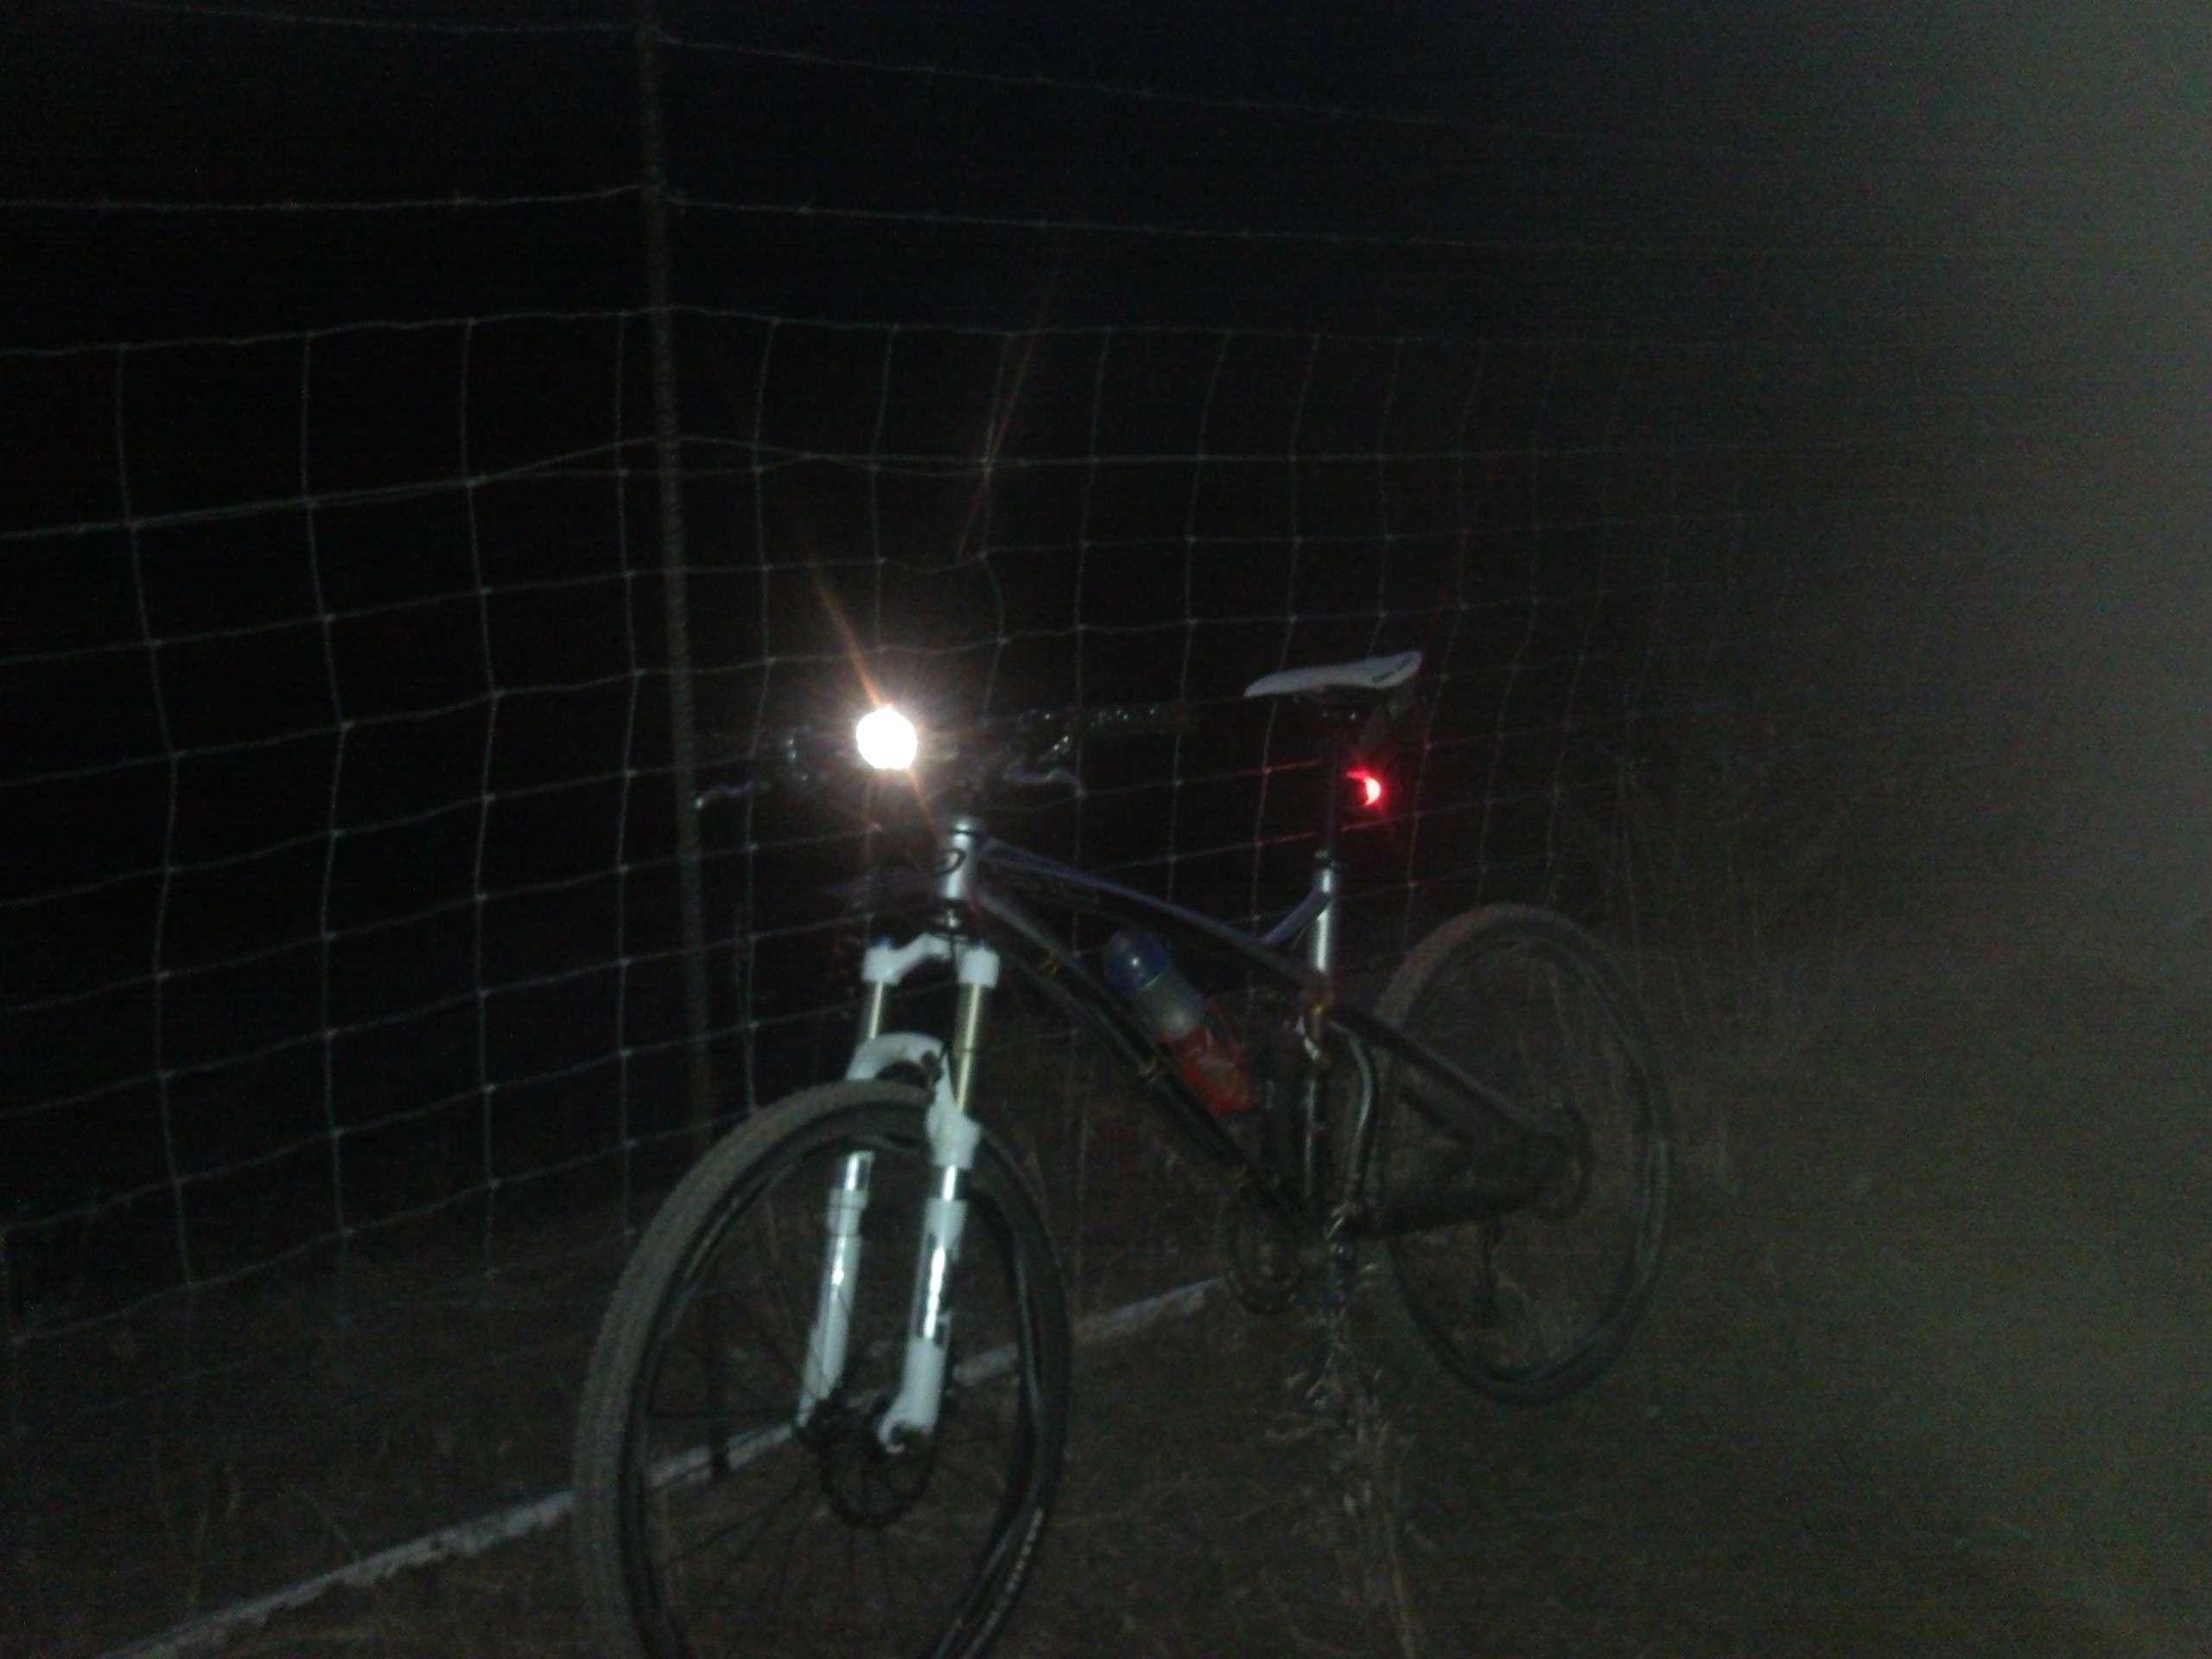 salida nocturna solitaria 11072010